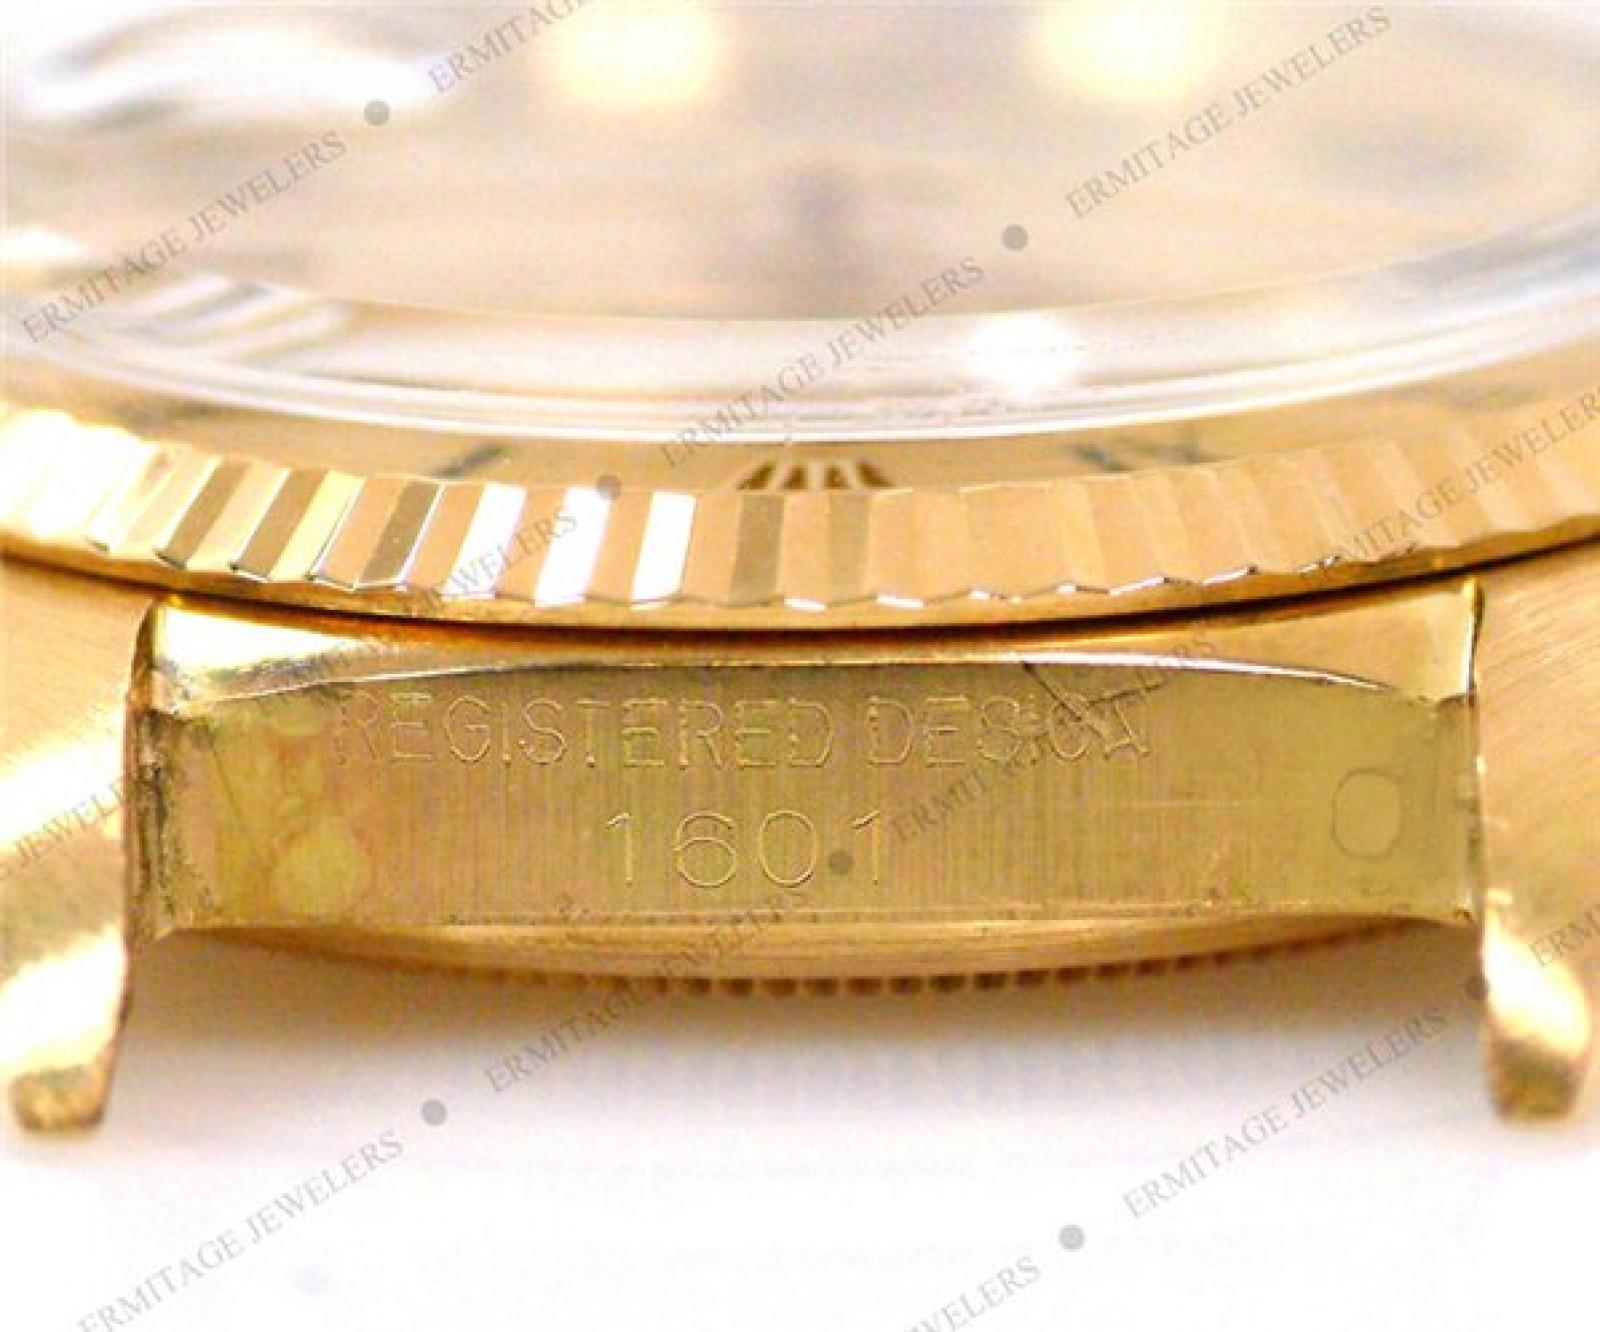 Vintage Rare Rolex Datejust 1601 Gold Year Circa 1961